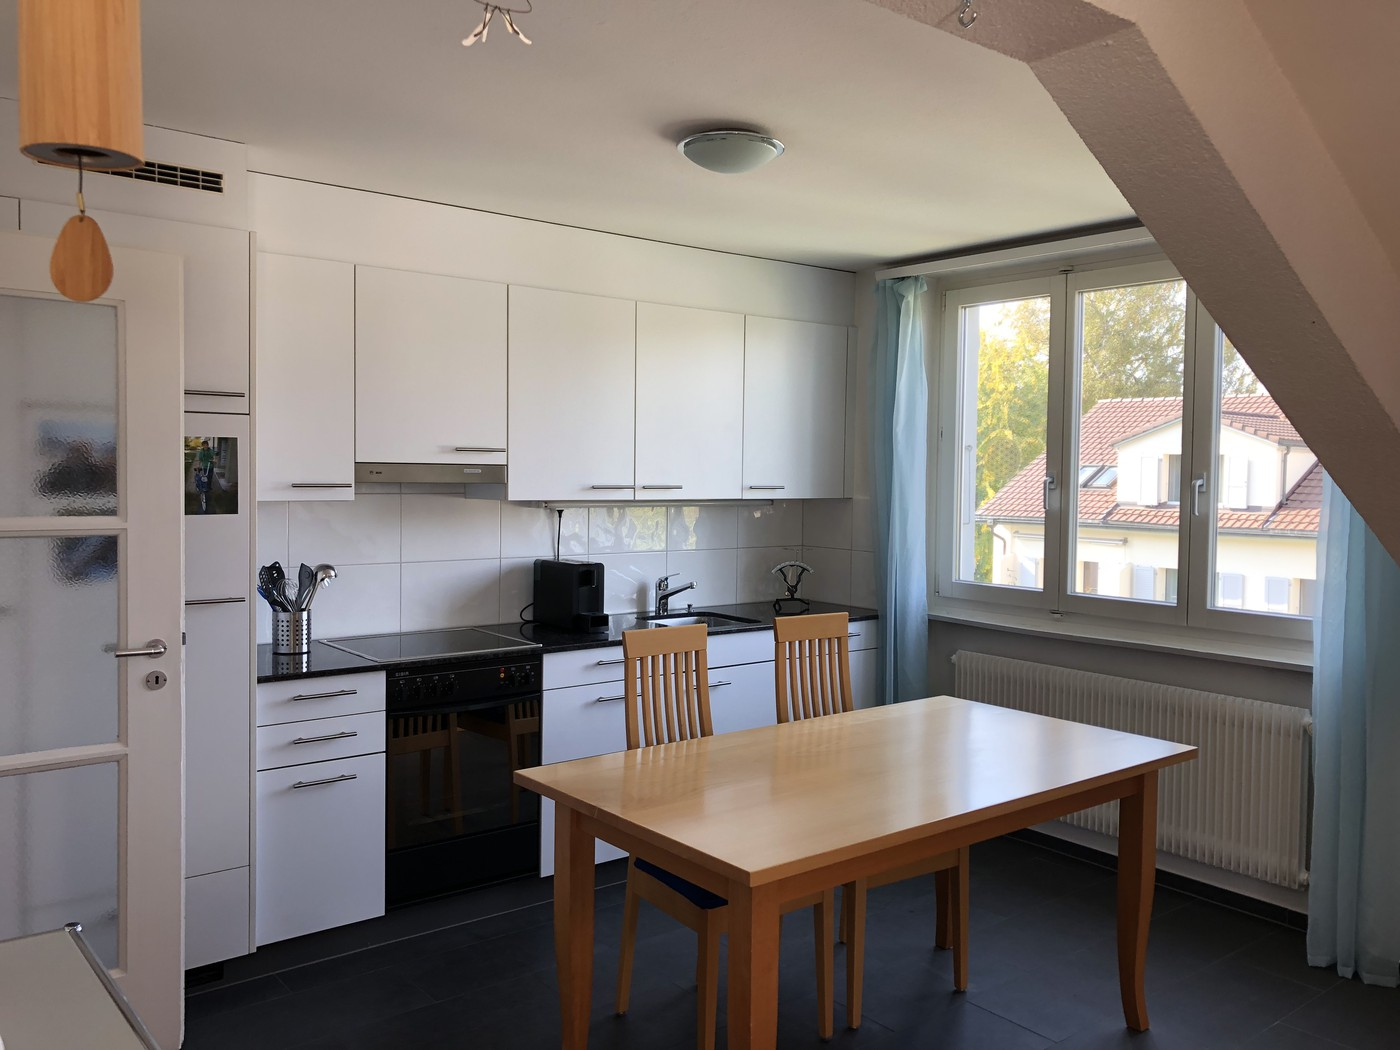 louer appartement mansardé 2 pièces à liebefeld - flatfox